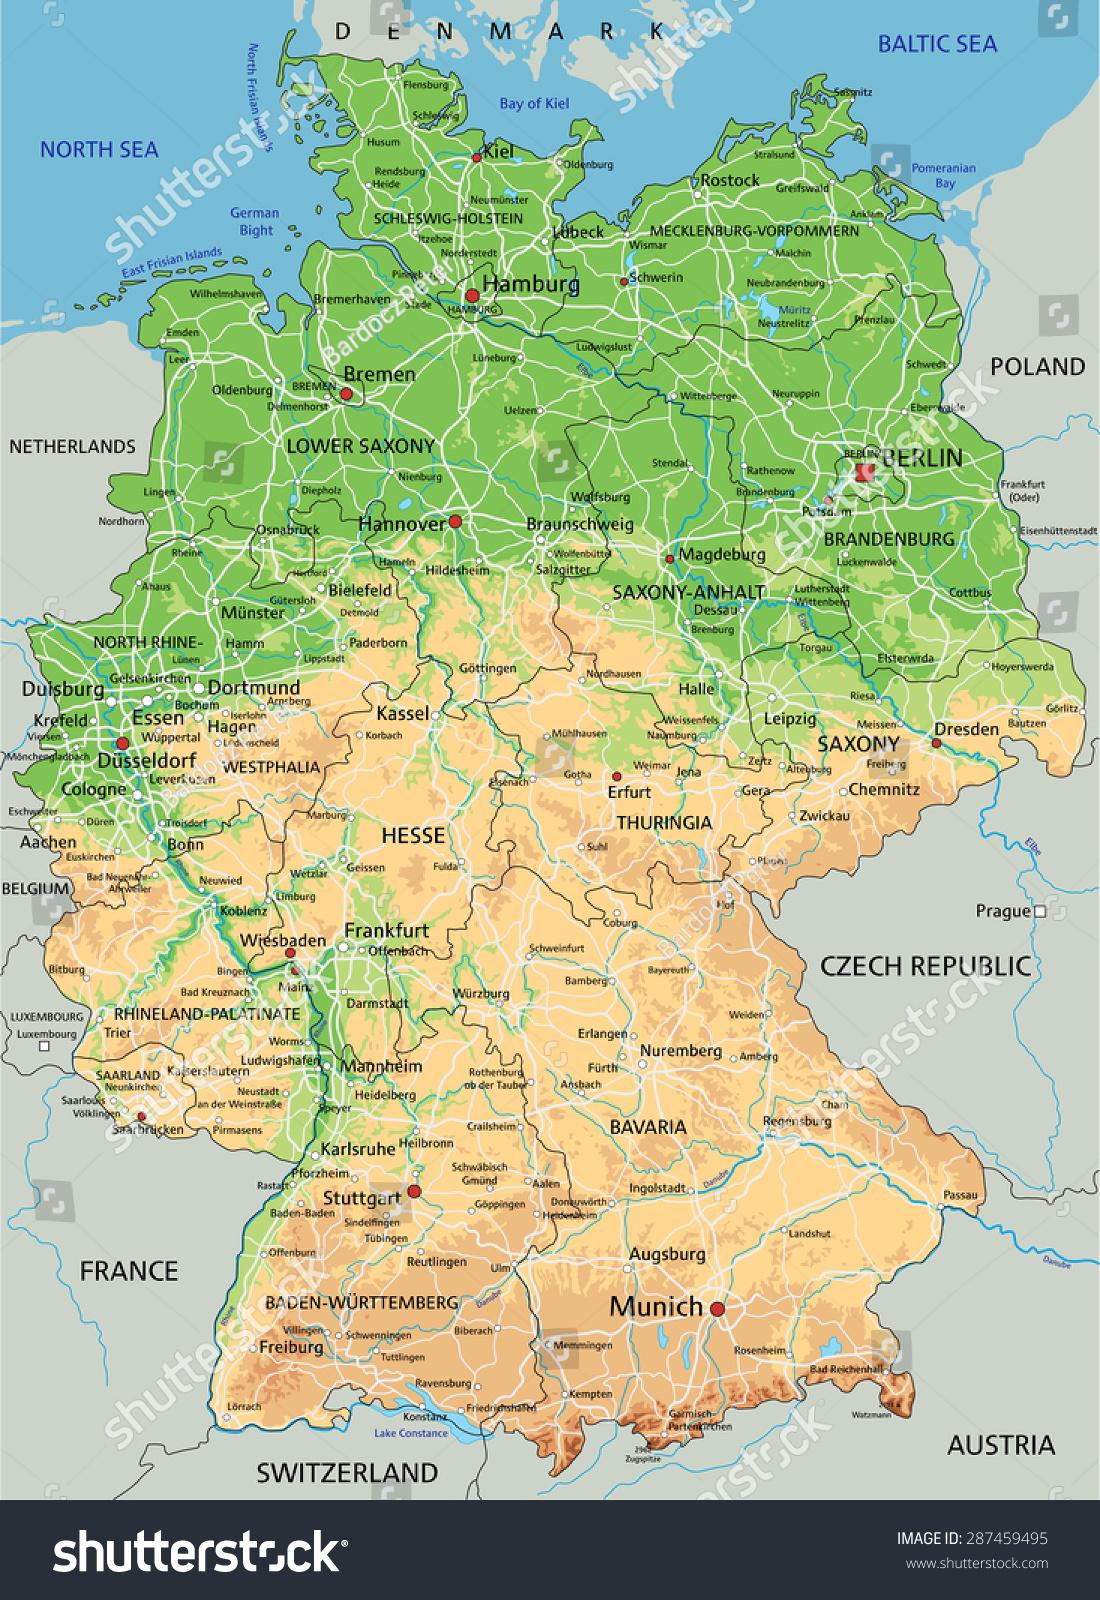 Picture of: Vector De Stock Libre De Regalias Sobre High Detailed Germany Physical Map Labeling287459495